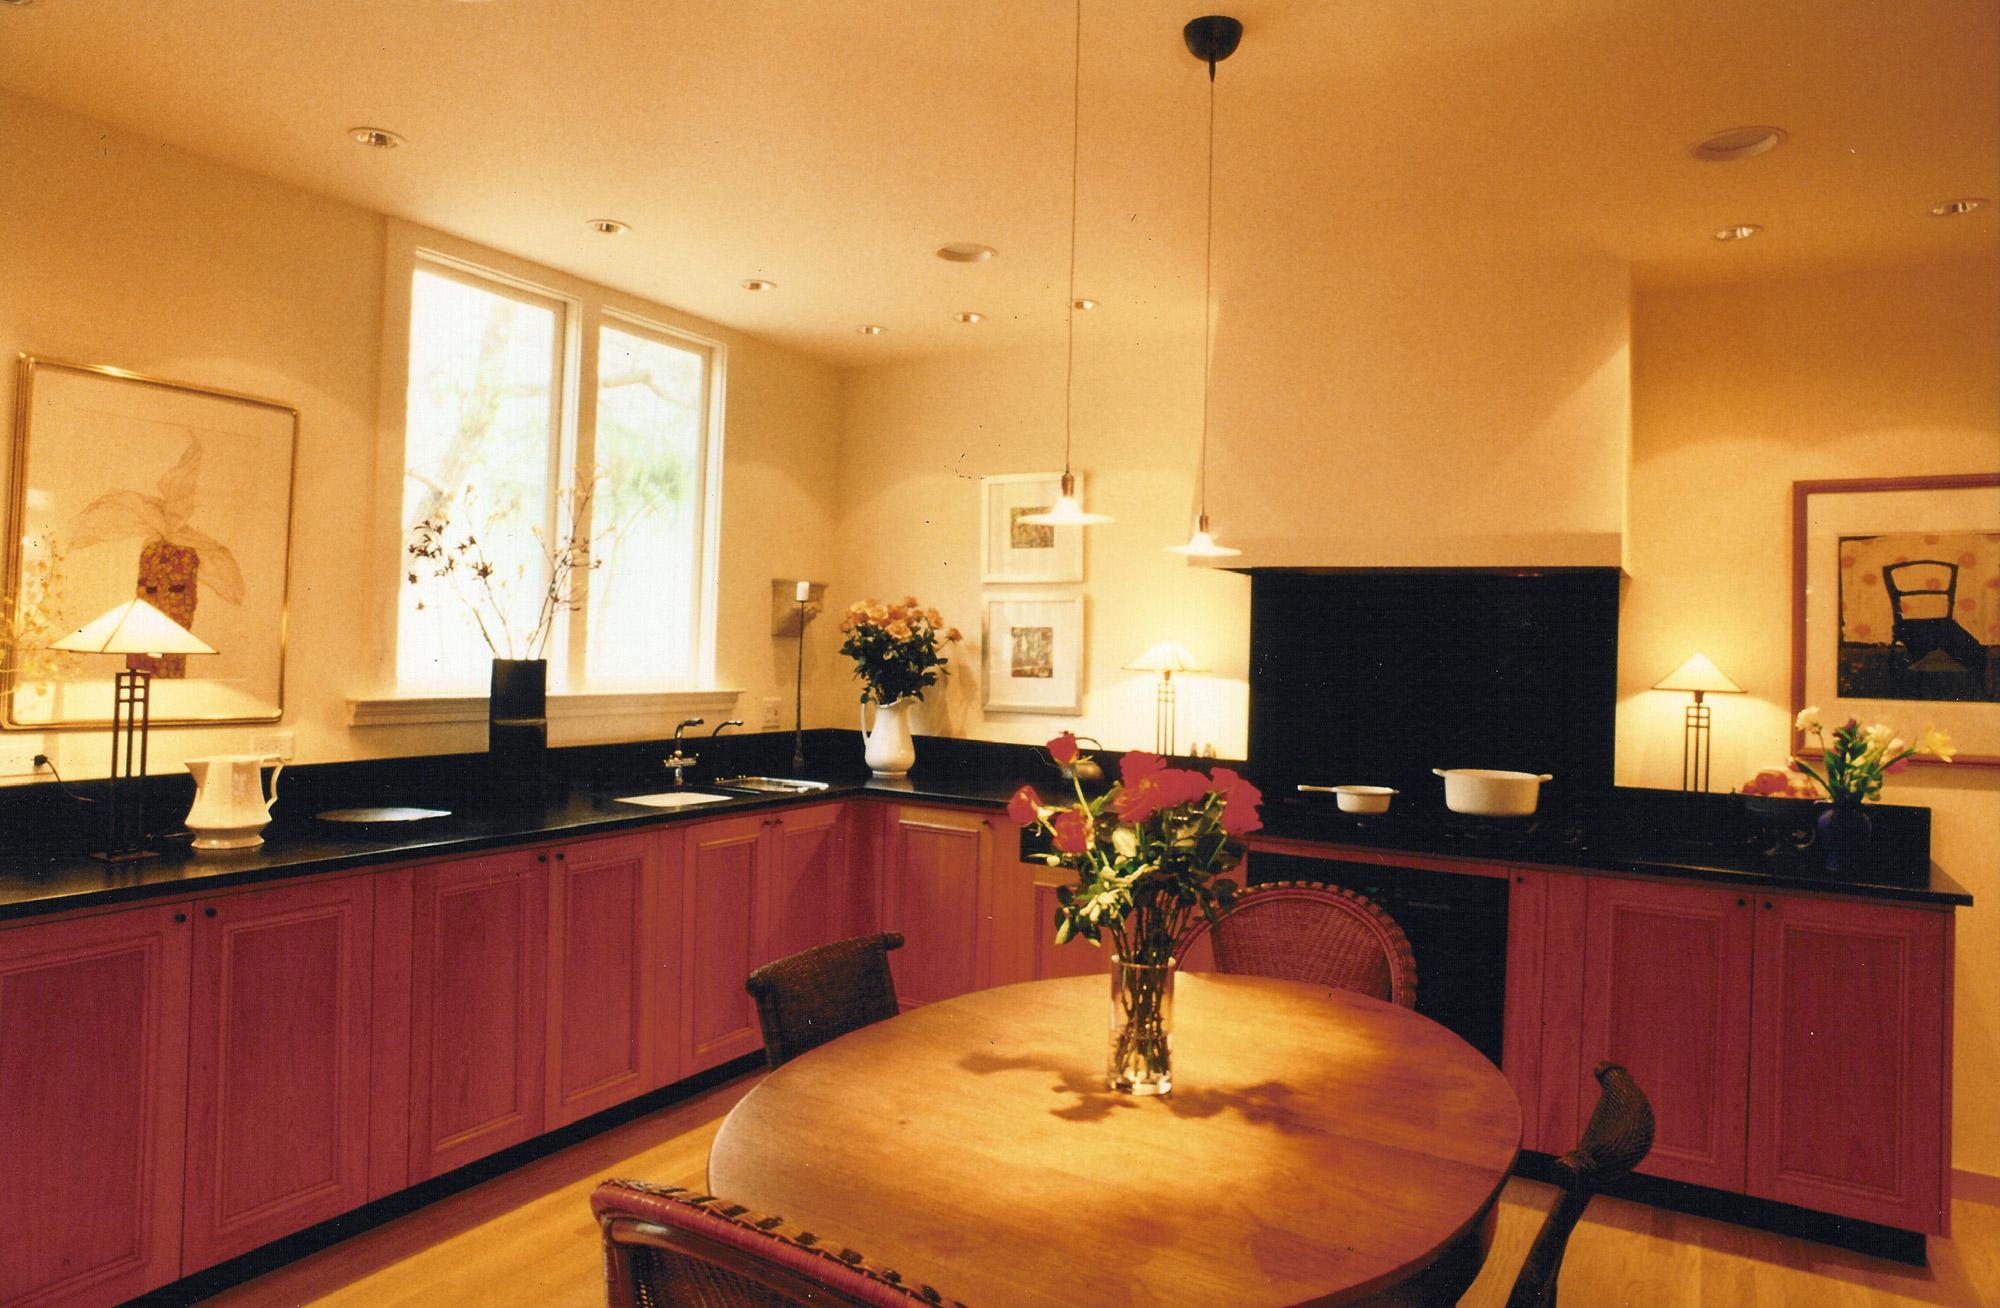 Kaplan-Architects-Berkeley-kitchen-remodel-4.jpg